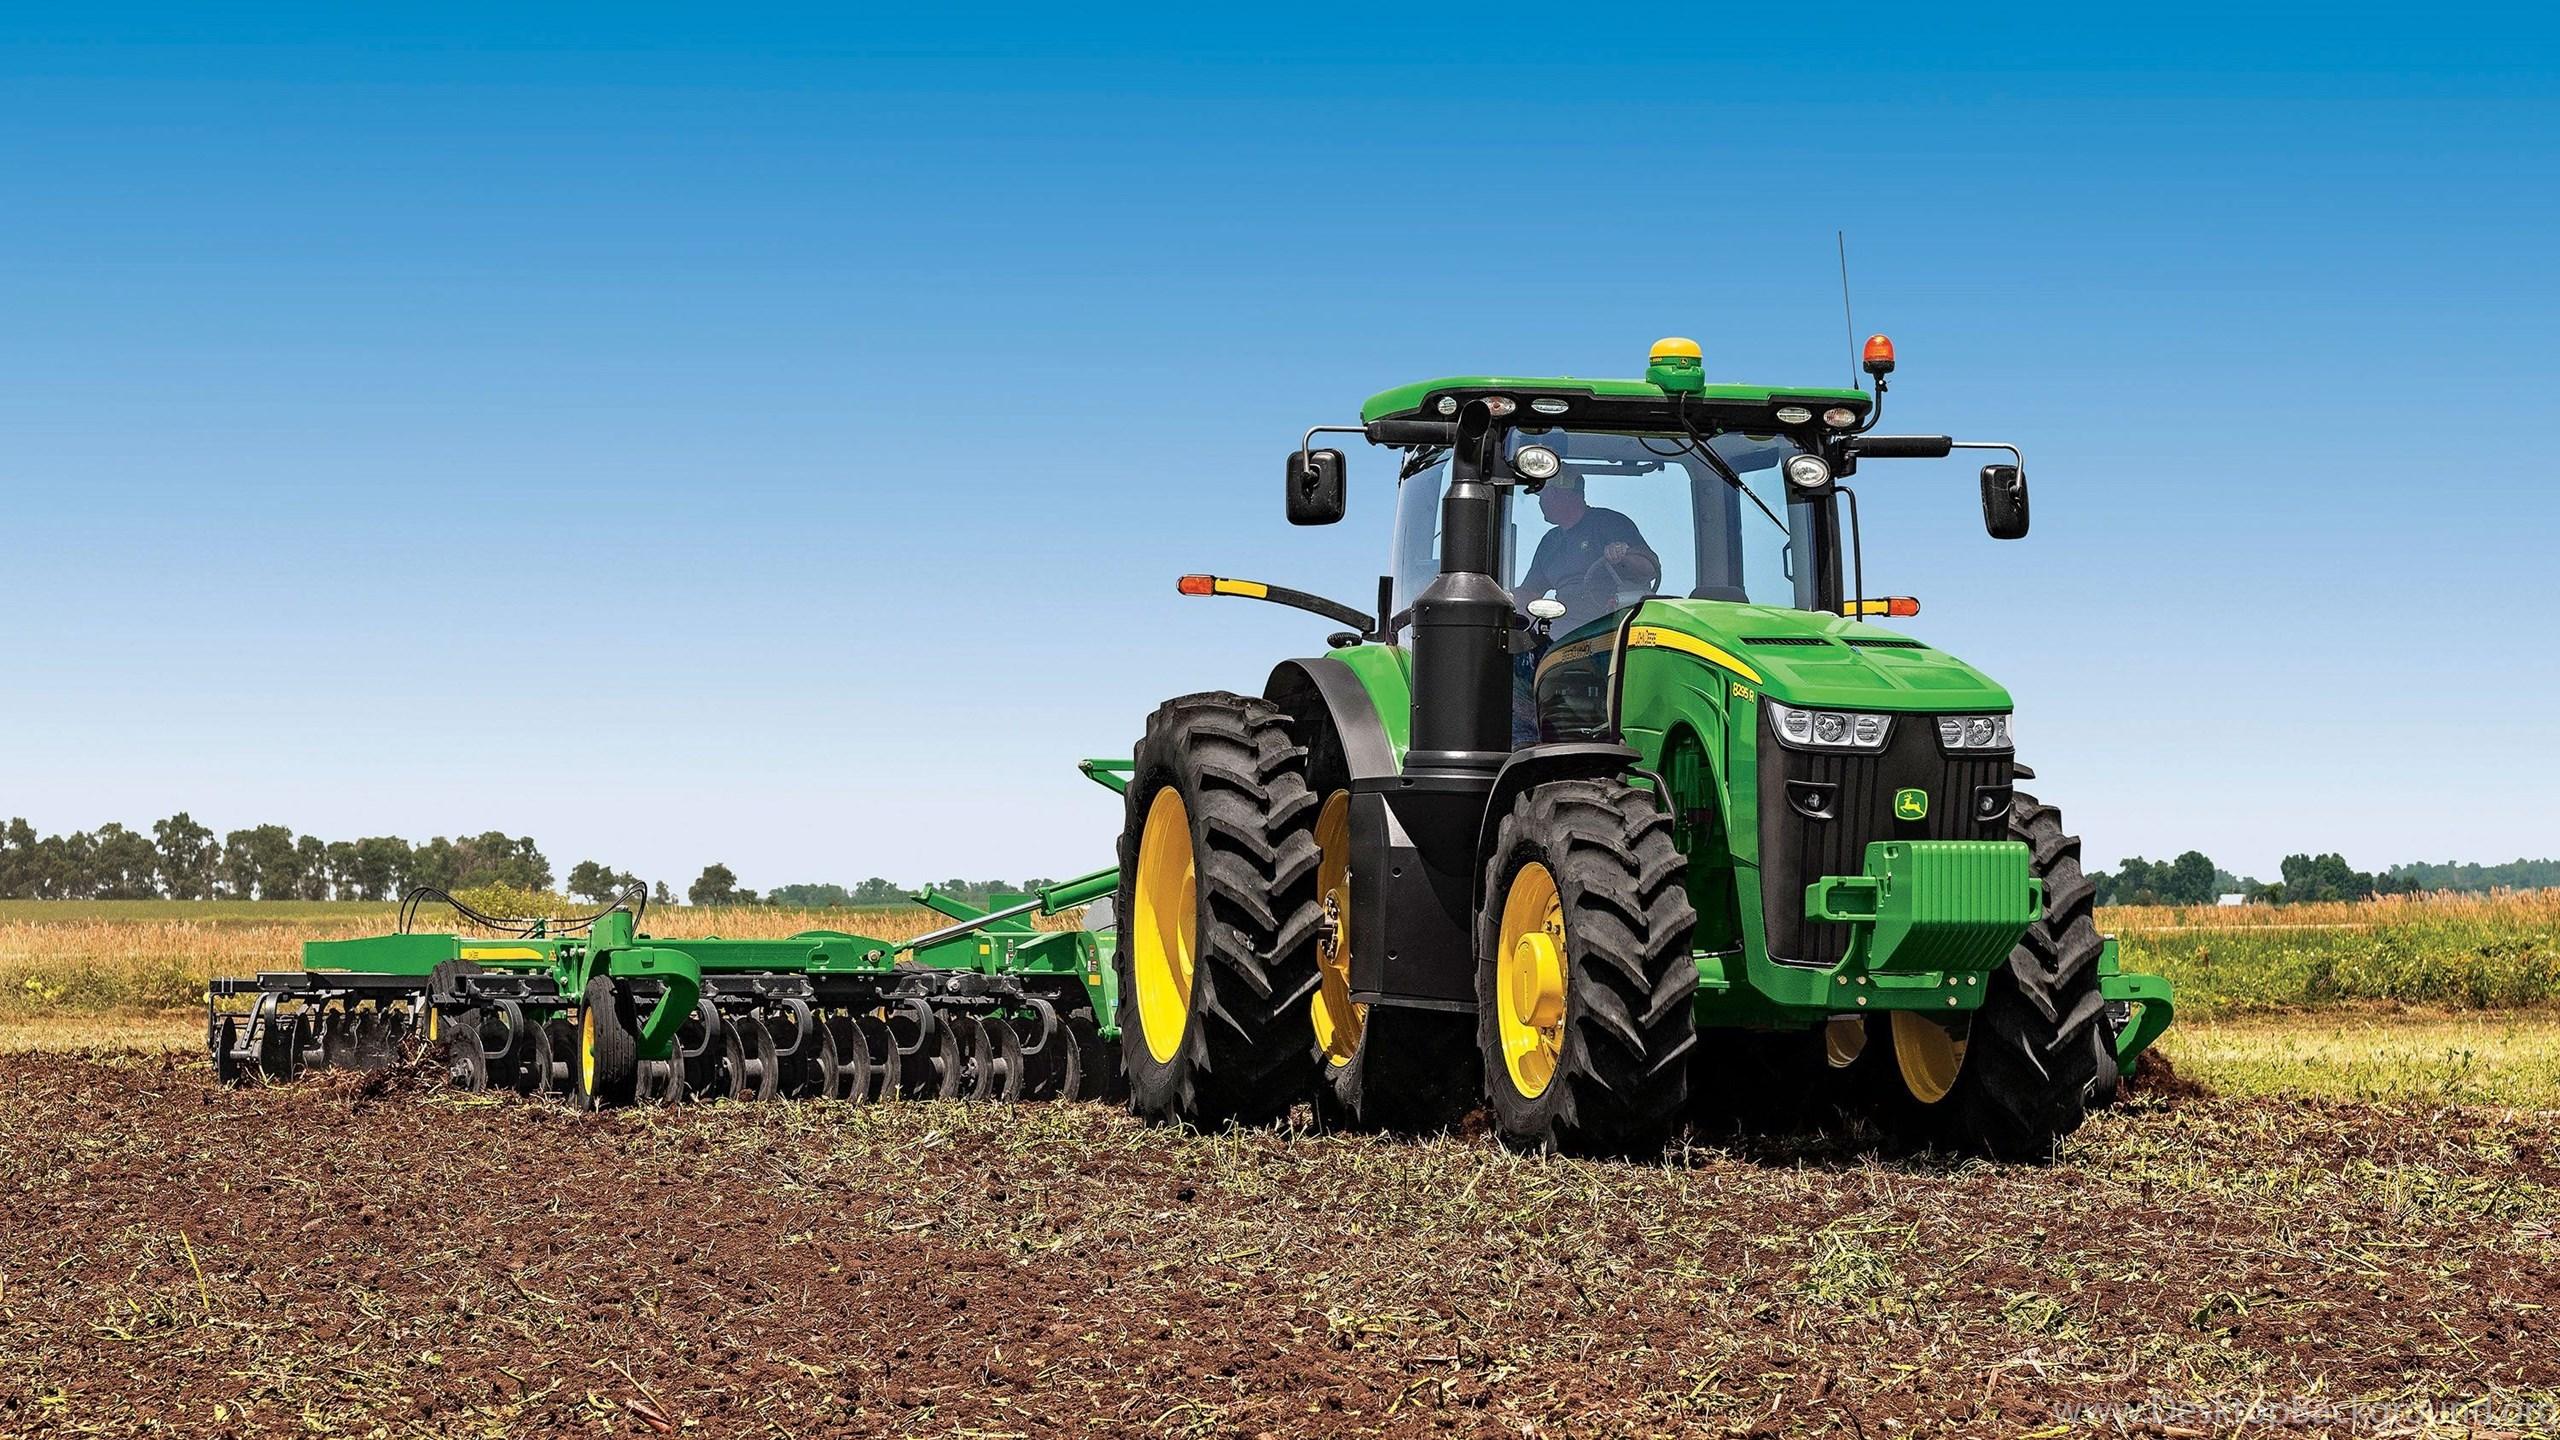 JOHN DEERE Tractor Farm Industrial Farming 1jdeere Construction